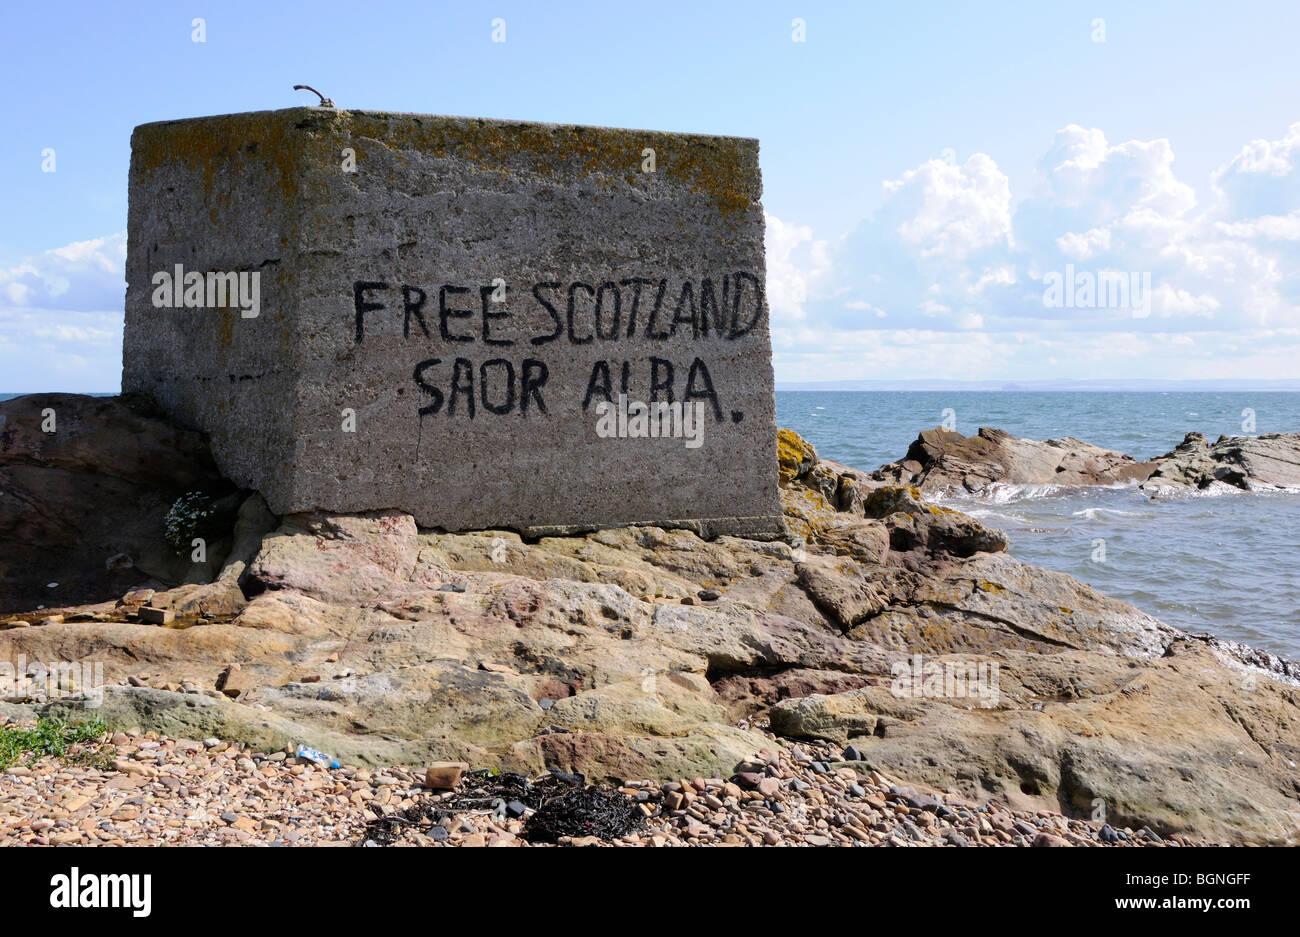 Free Scotland, Saor Alba - Stock Image